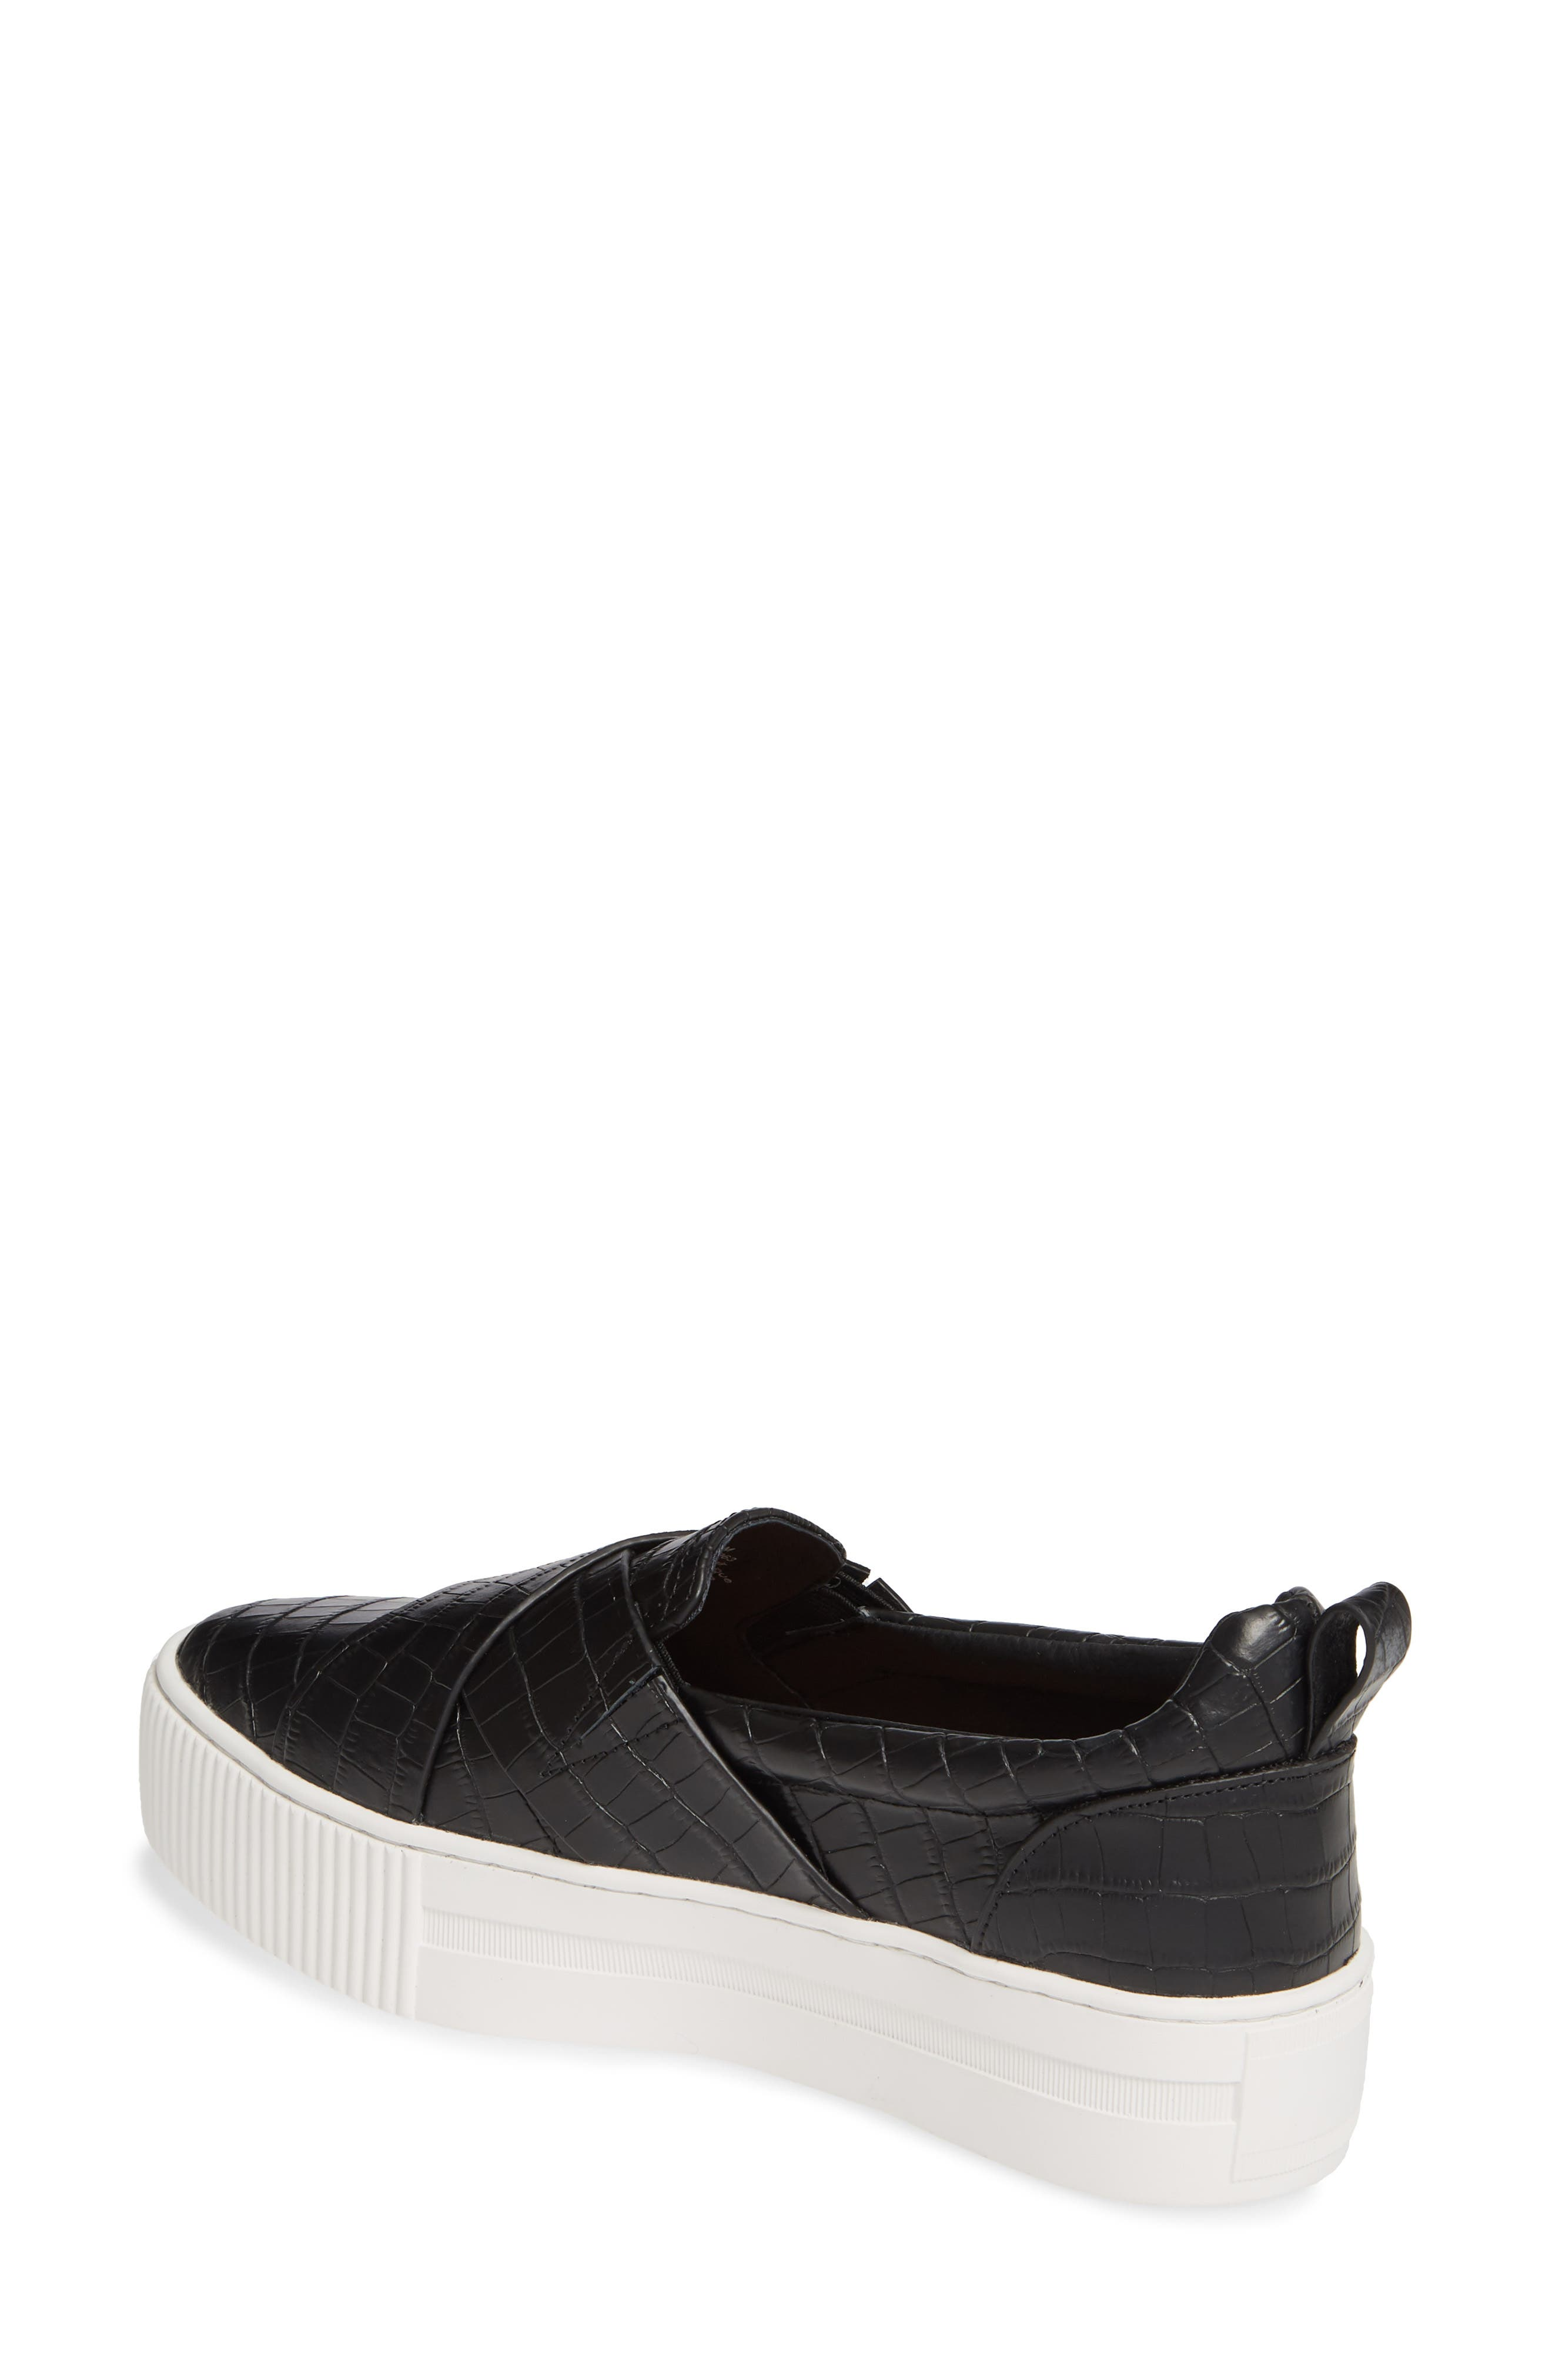 HALOGEN<SUP>®</SUP>, Blakely Slip-On Platform Sneaker, Alternate thumbnail 2, color, BLACK CROCO PRINTED LEATHER